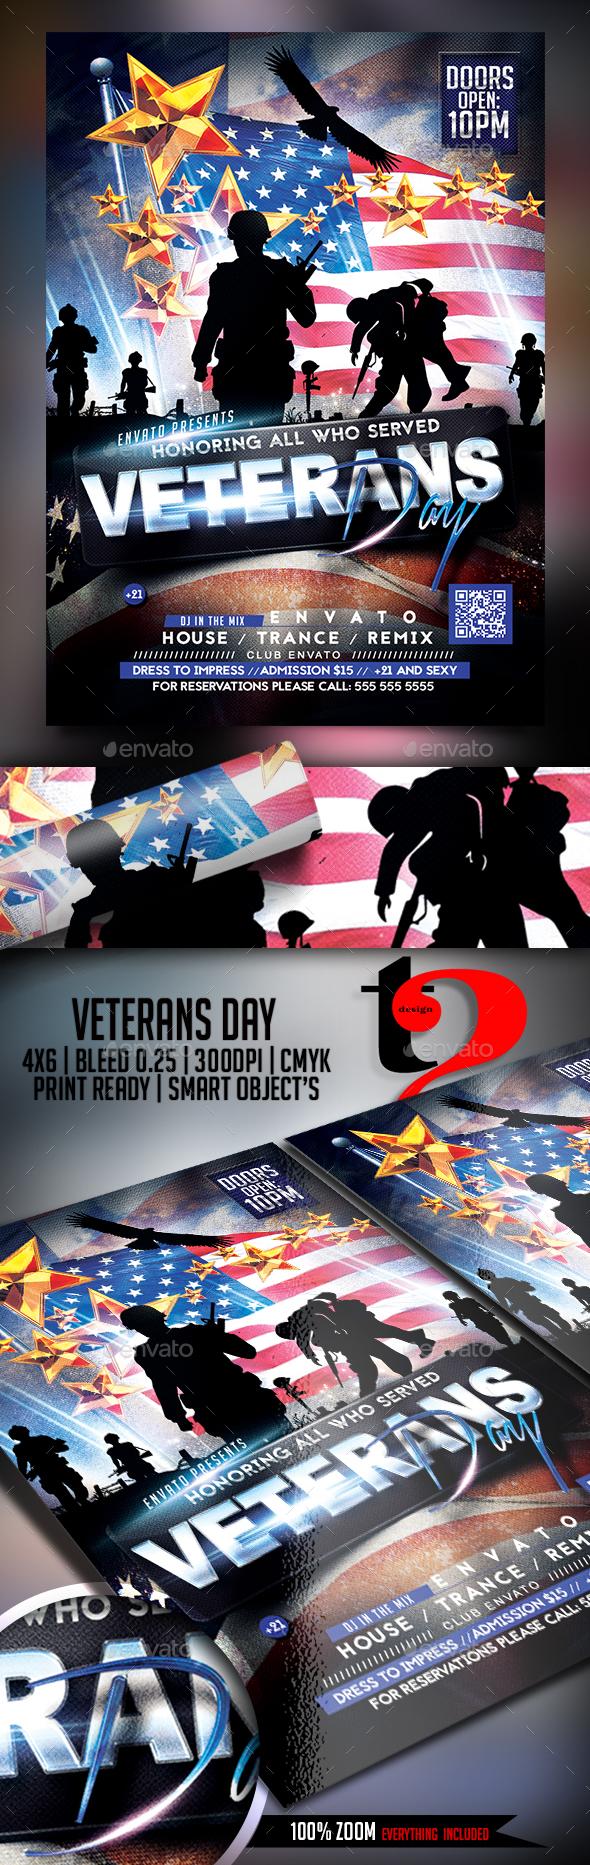 Veterans Day Celebration Flyer